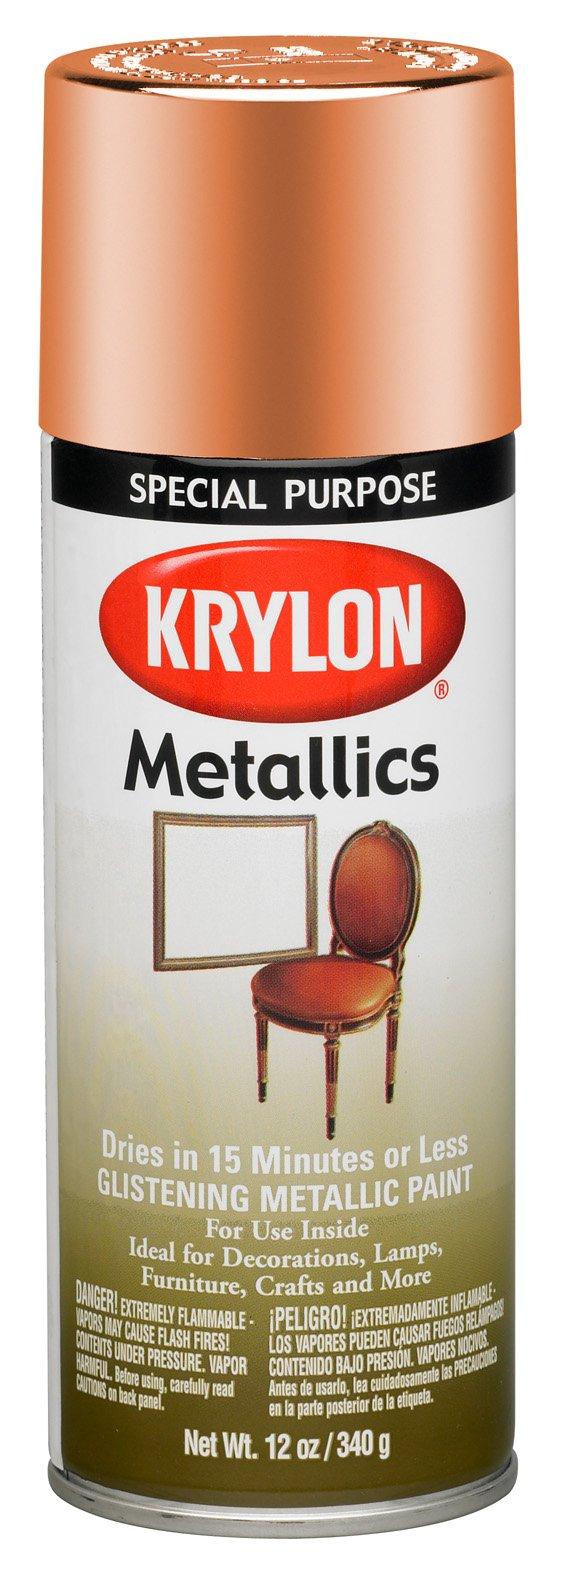 Krylon 1709-6 PK Copper Metallic 12 Ounce Aerosol, (Case of 6) Metallic Paint